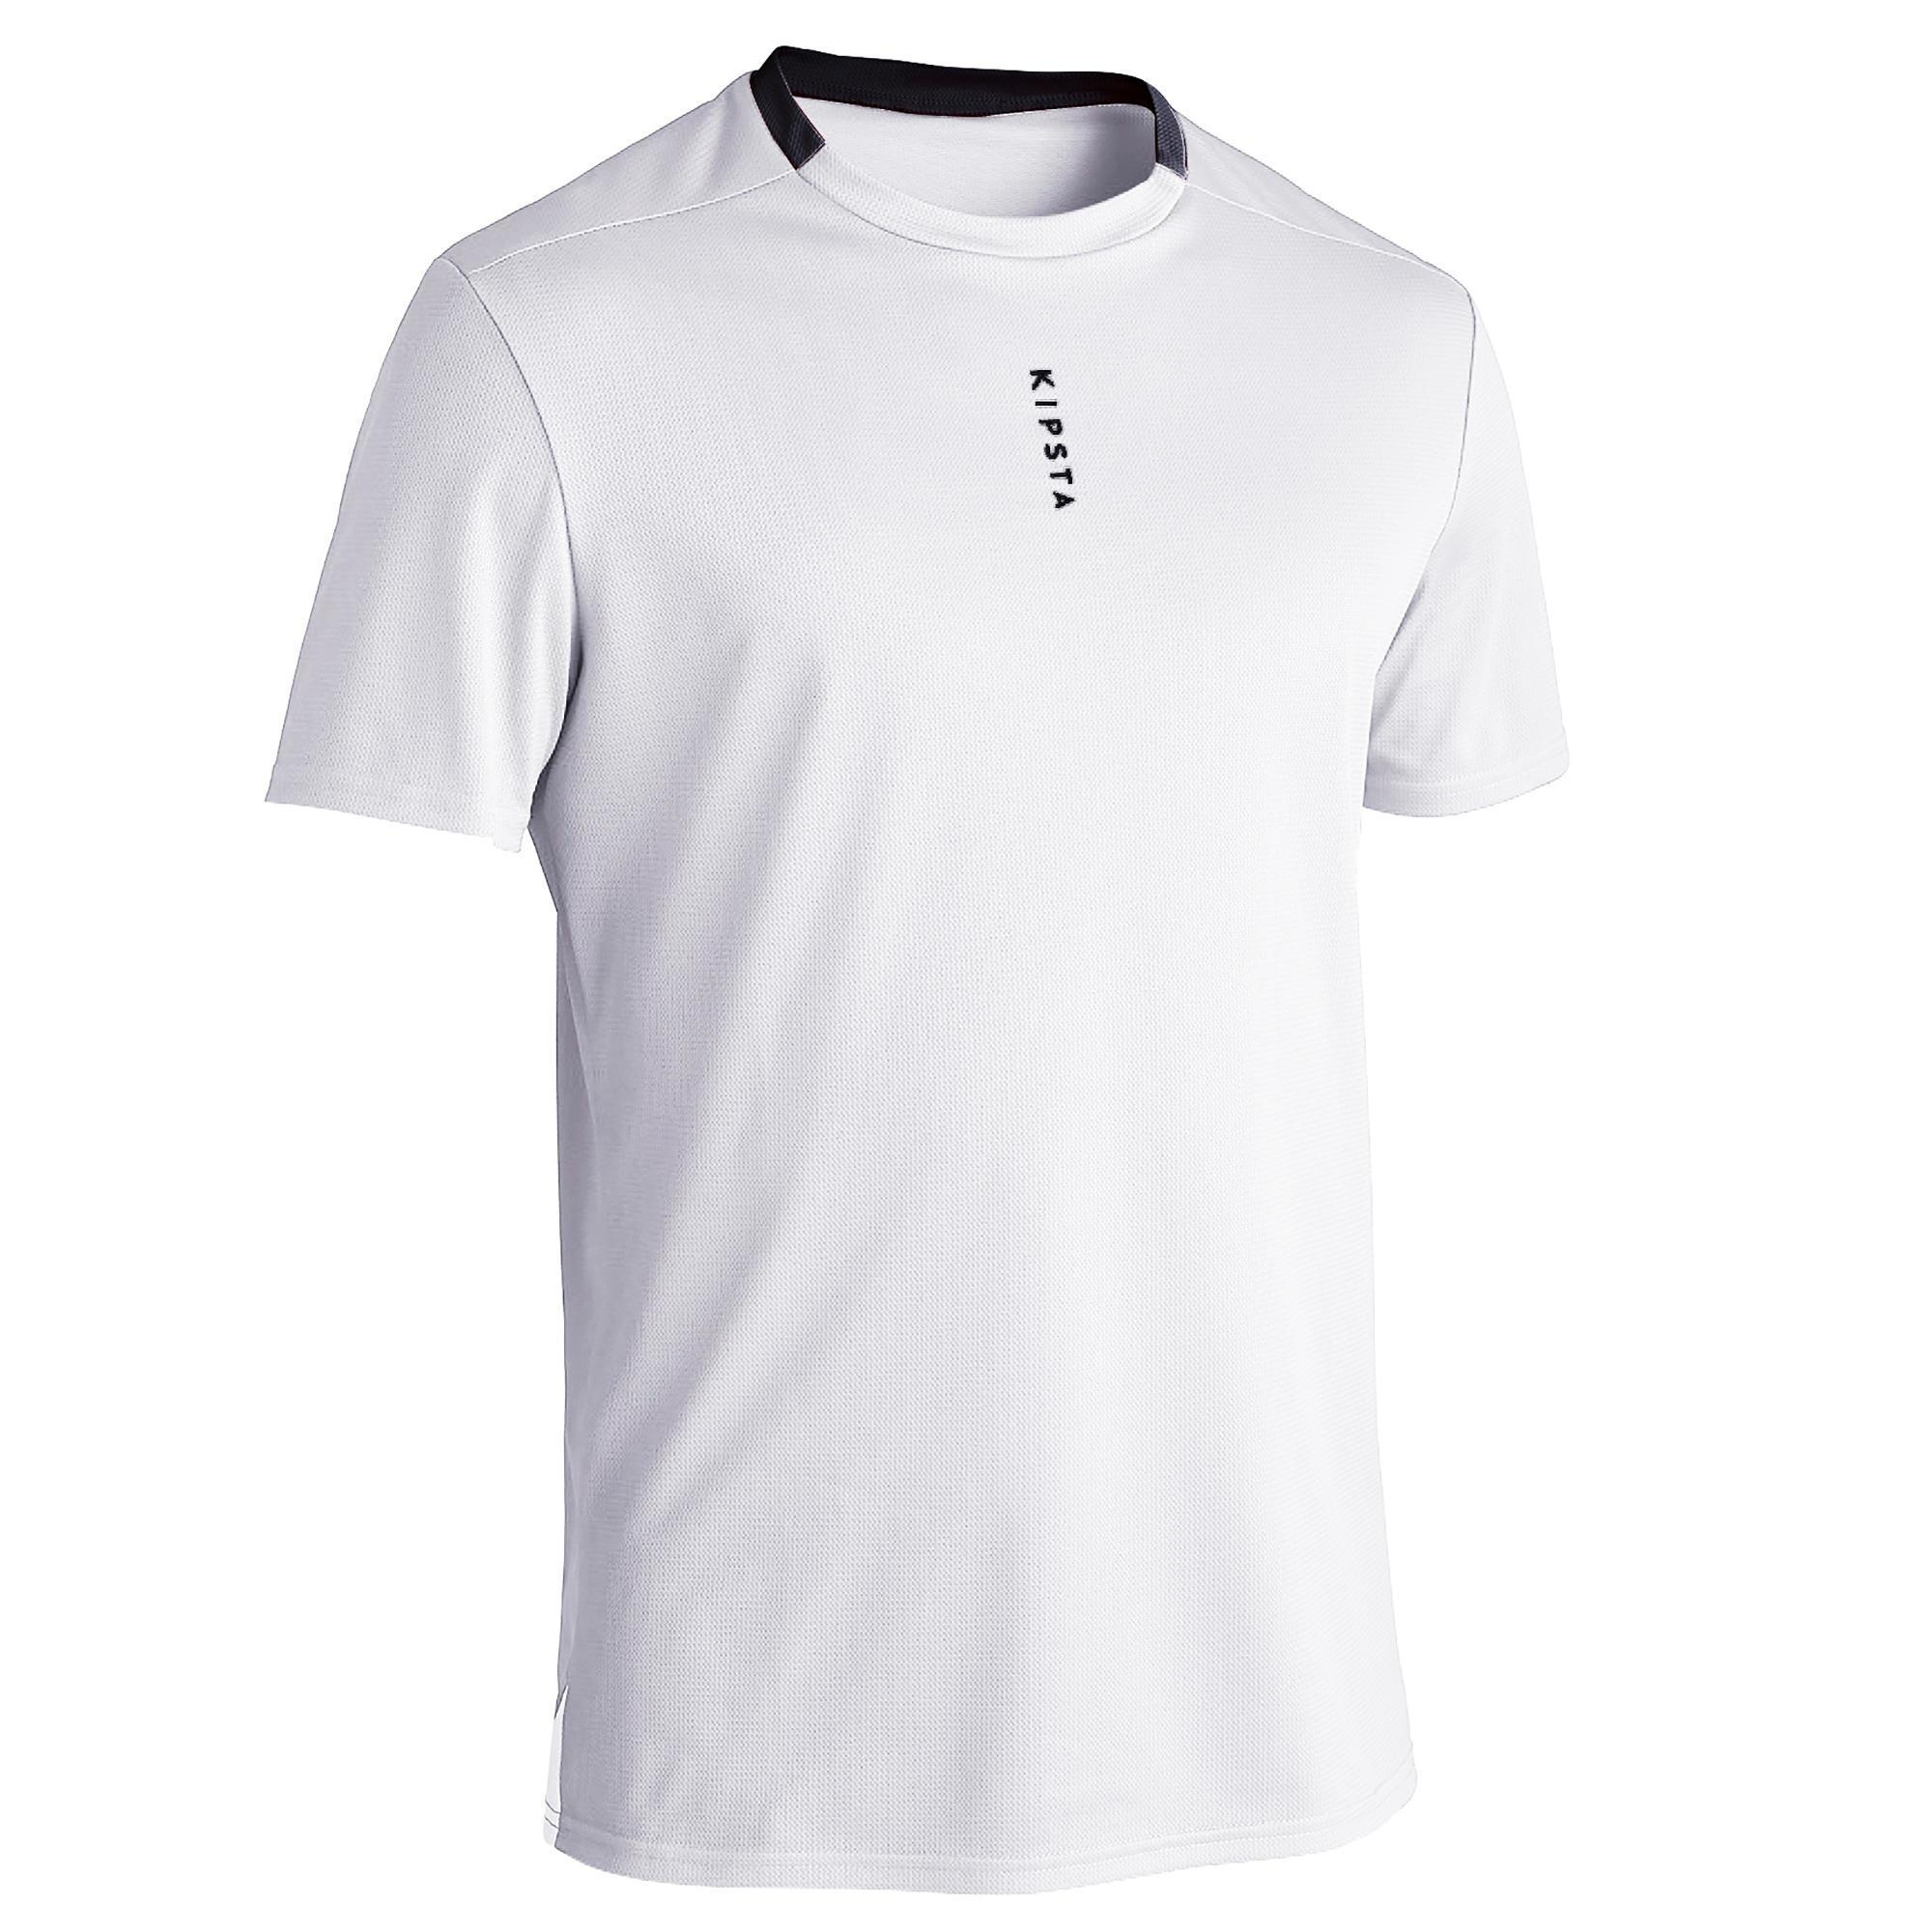 Fußballtrikot F100 Erwachsene | Sportbekleidung > Trikots > Fußballtrikots | Kipsta